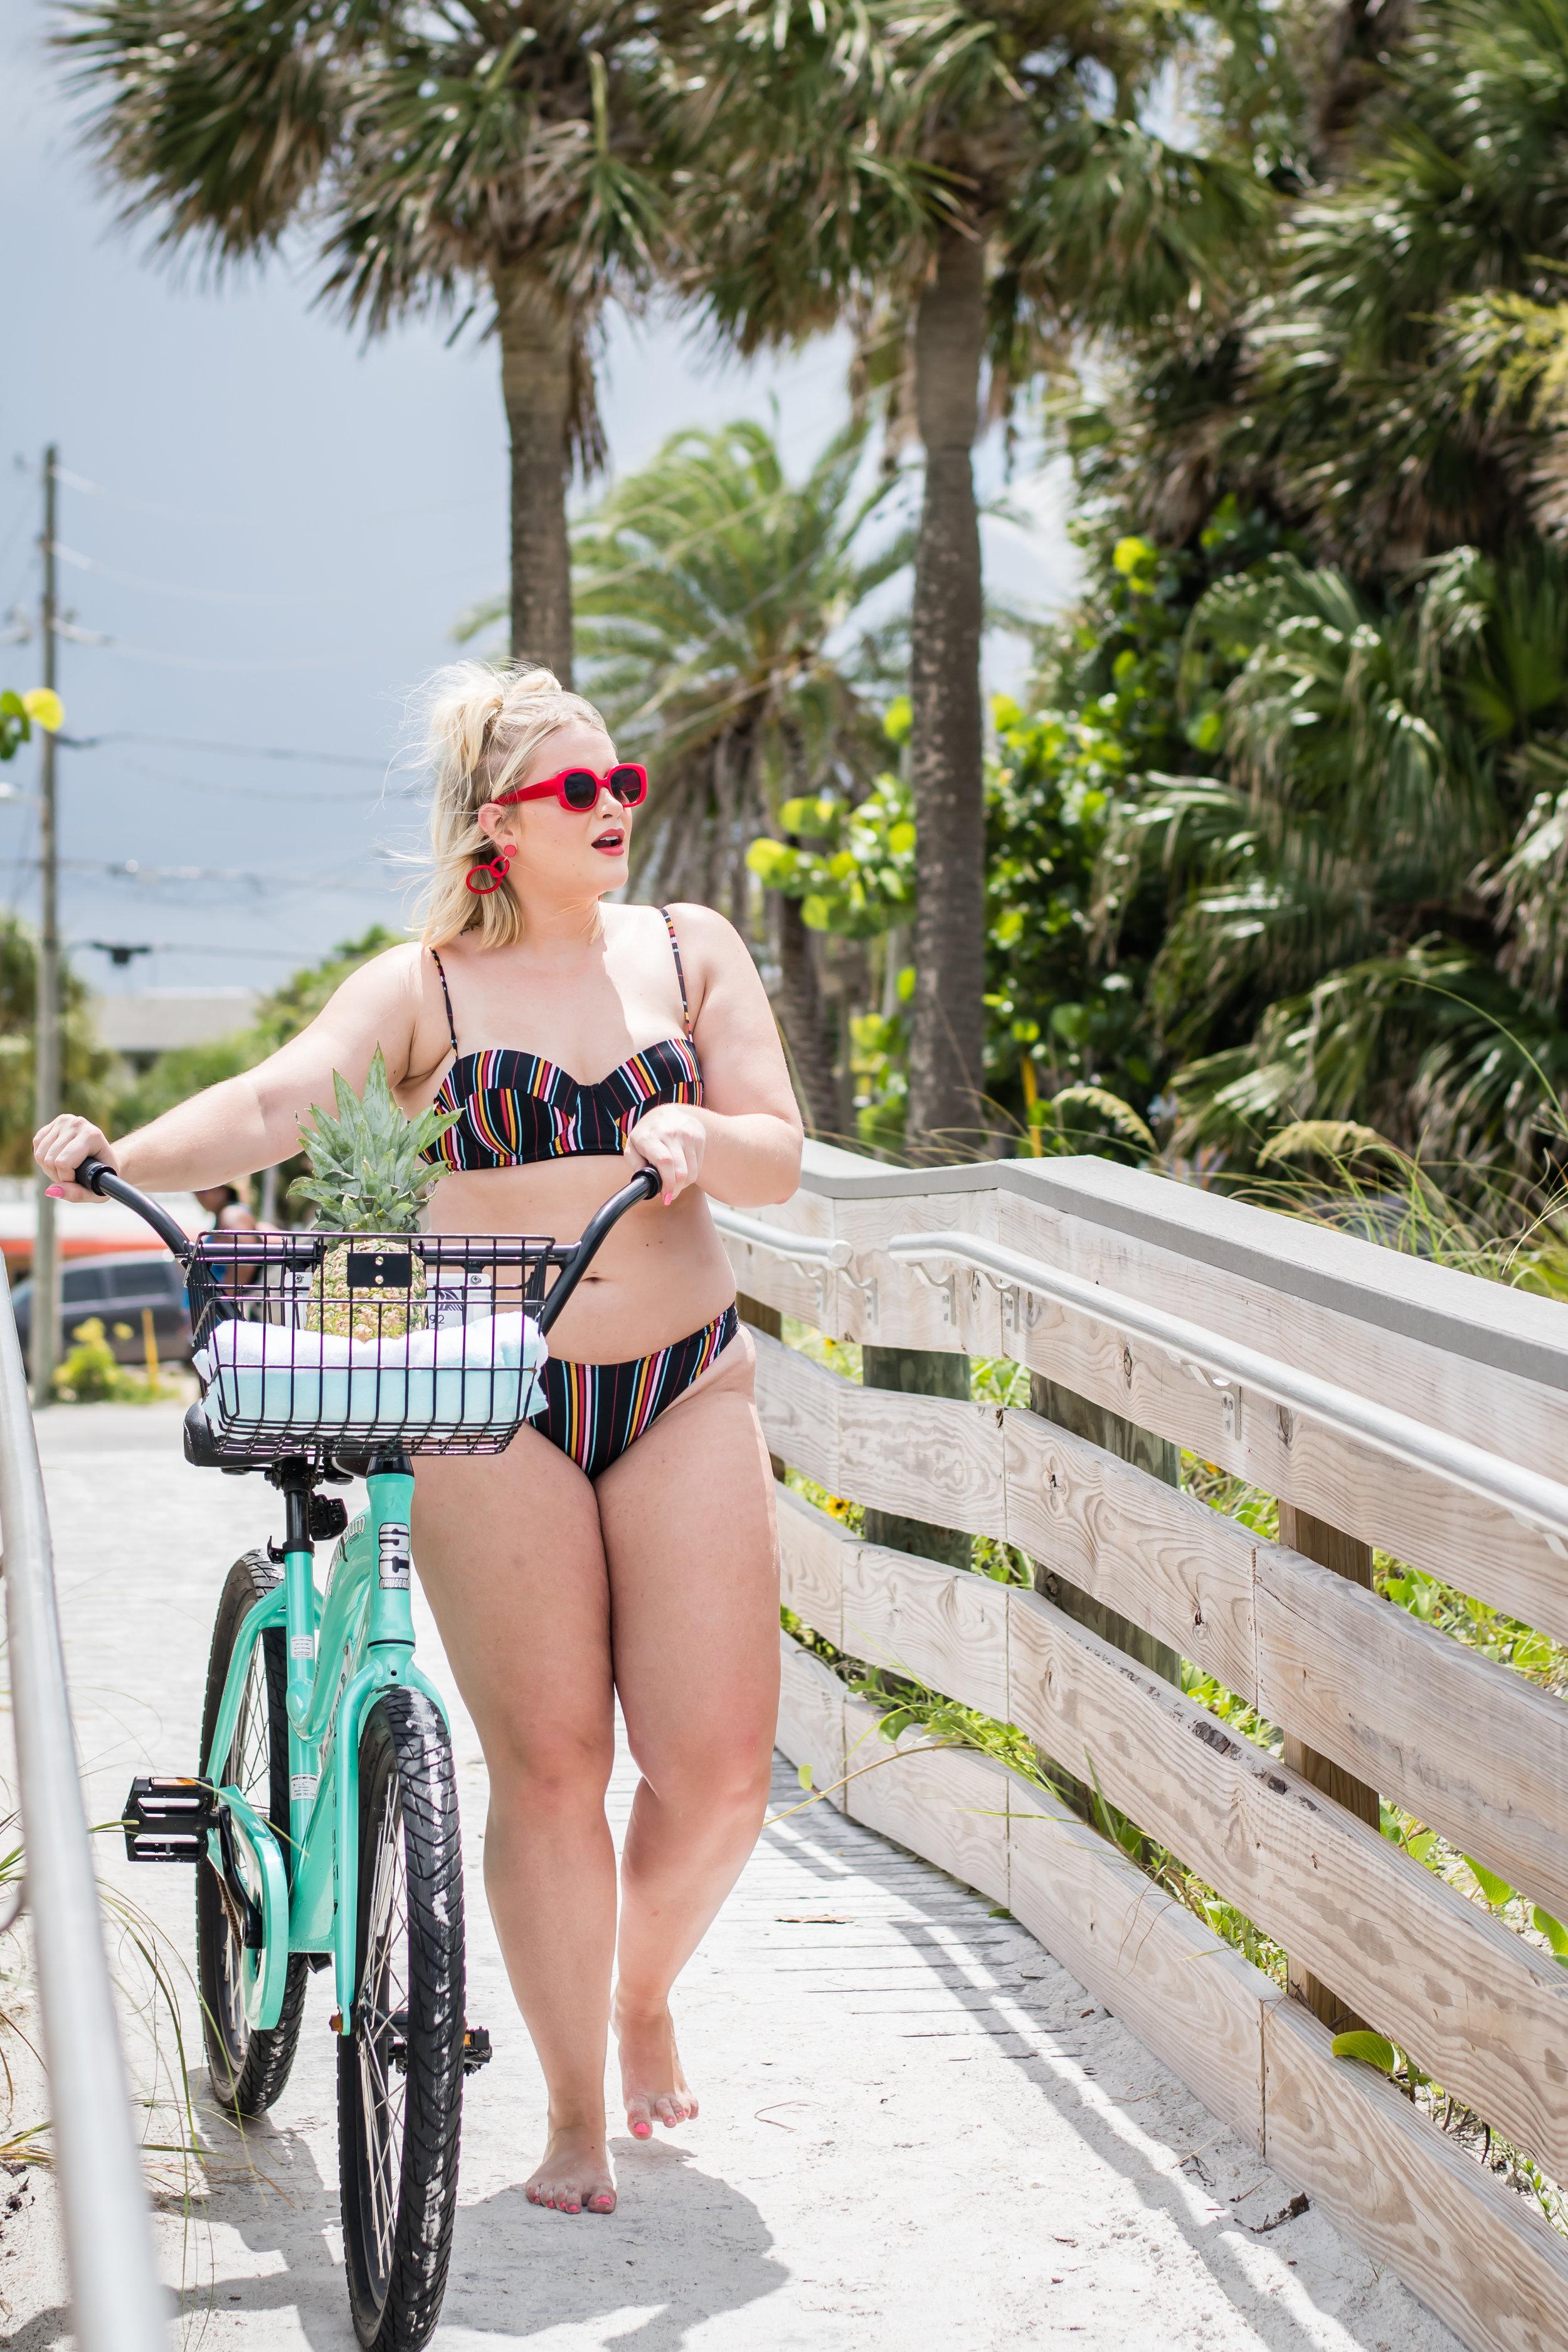 body-positive-model-beach-photoshoot-orlando-photographer-yanitza-ninett-10.jpg